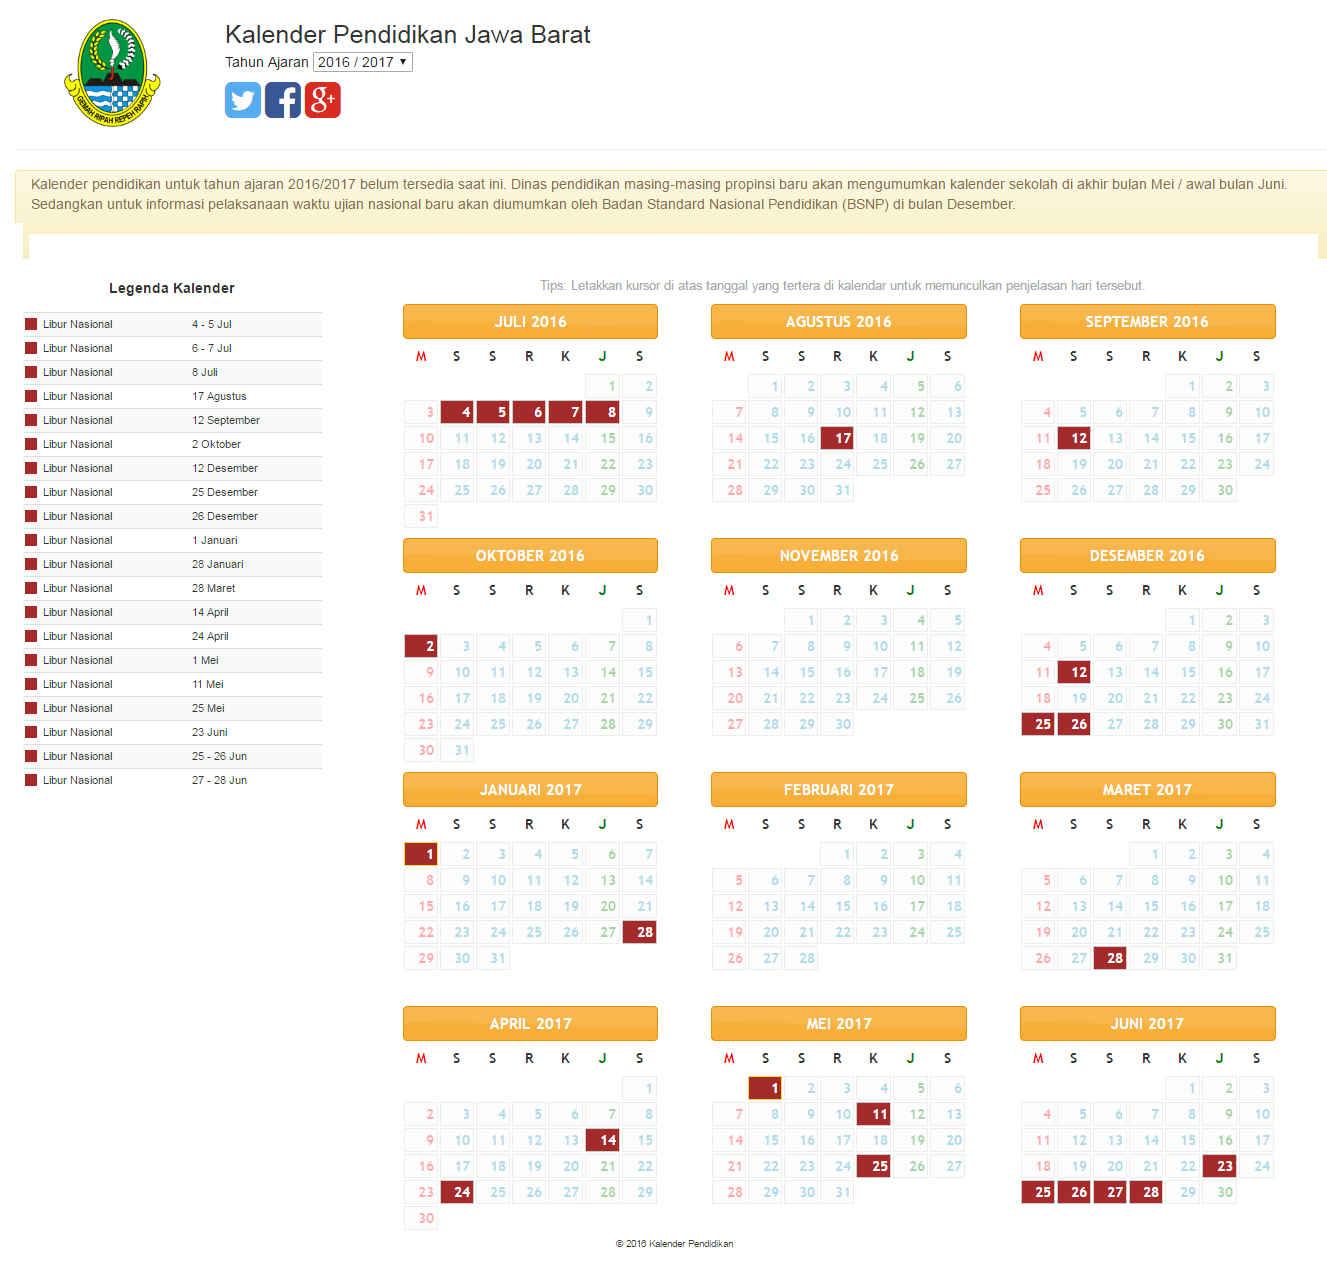 Kalender Pendidikan 2016 Sulawesi Selatan Sdn Kaduara Barat 3 Kalender Pendidikan Tahun 2016